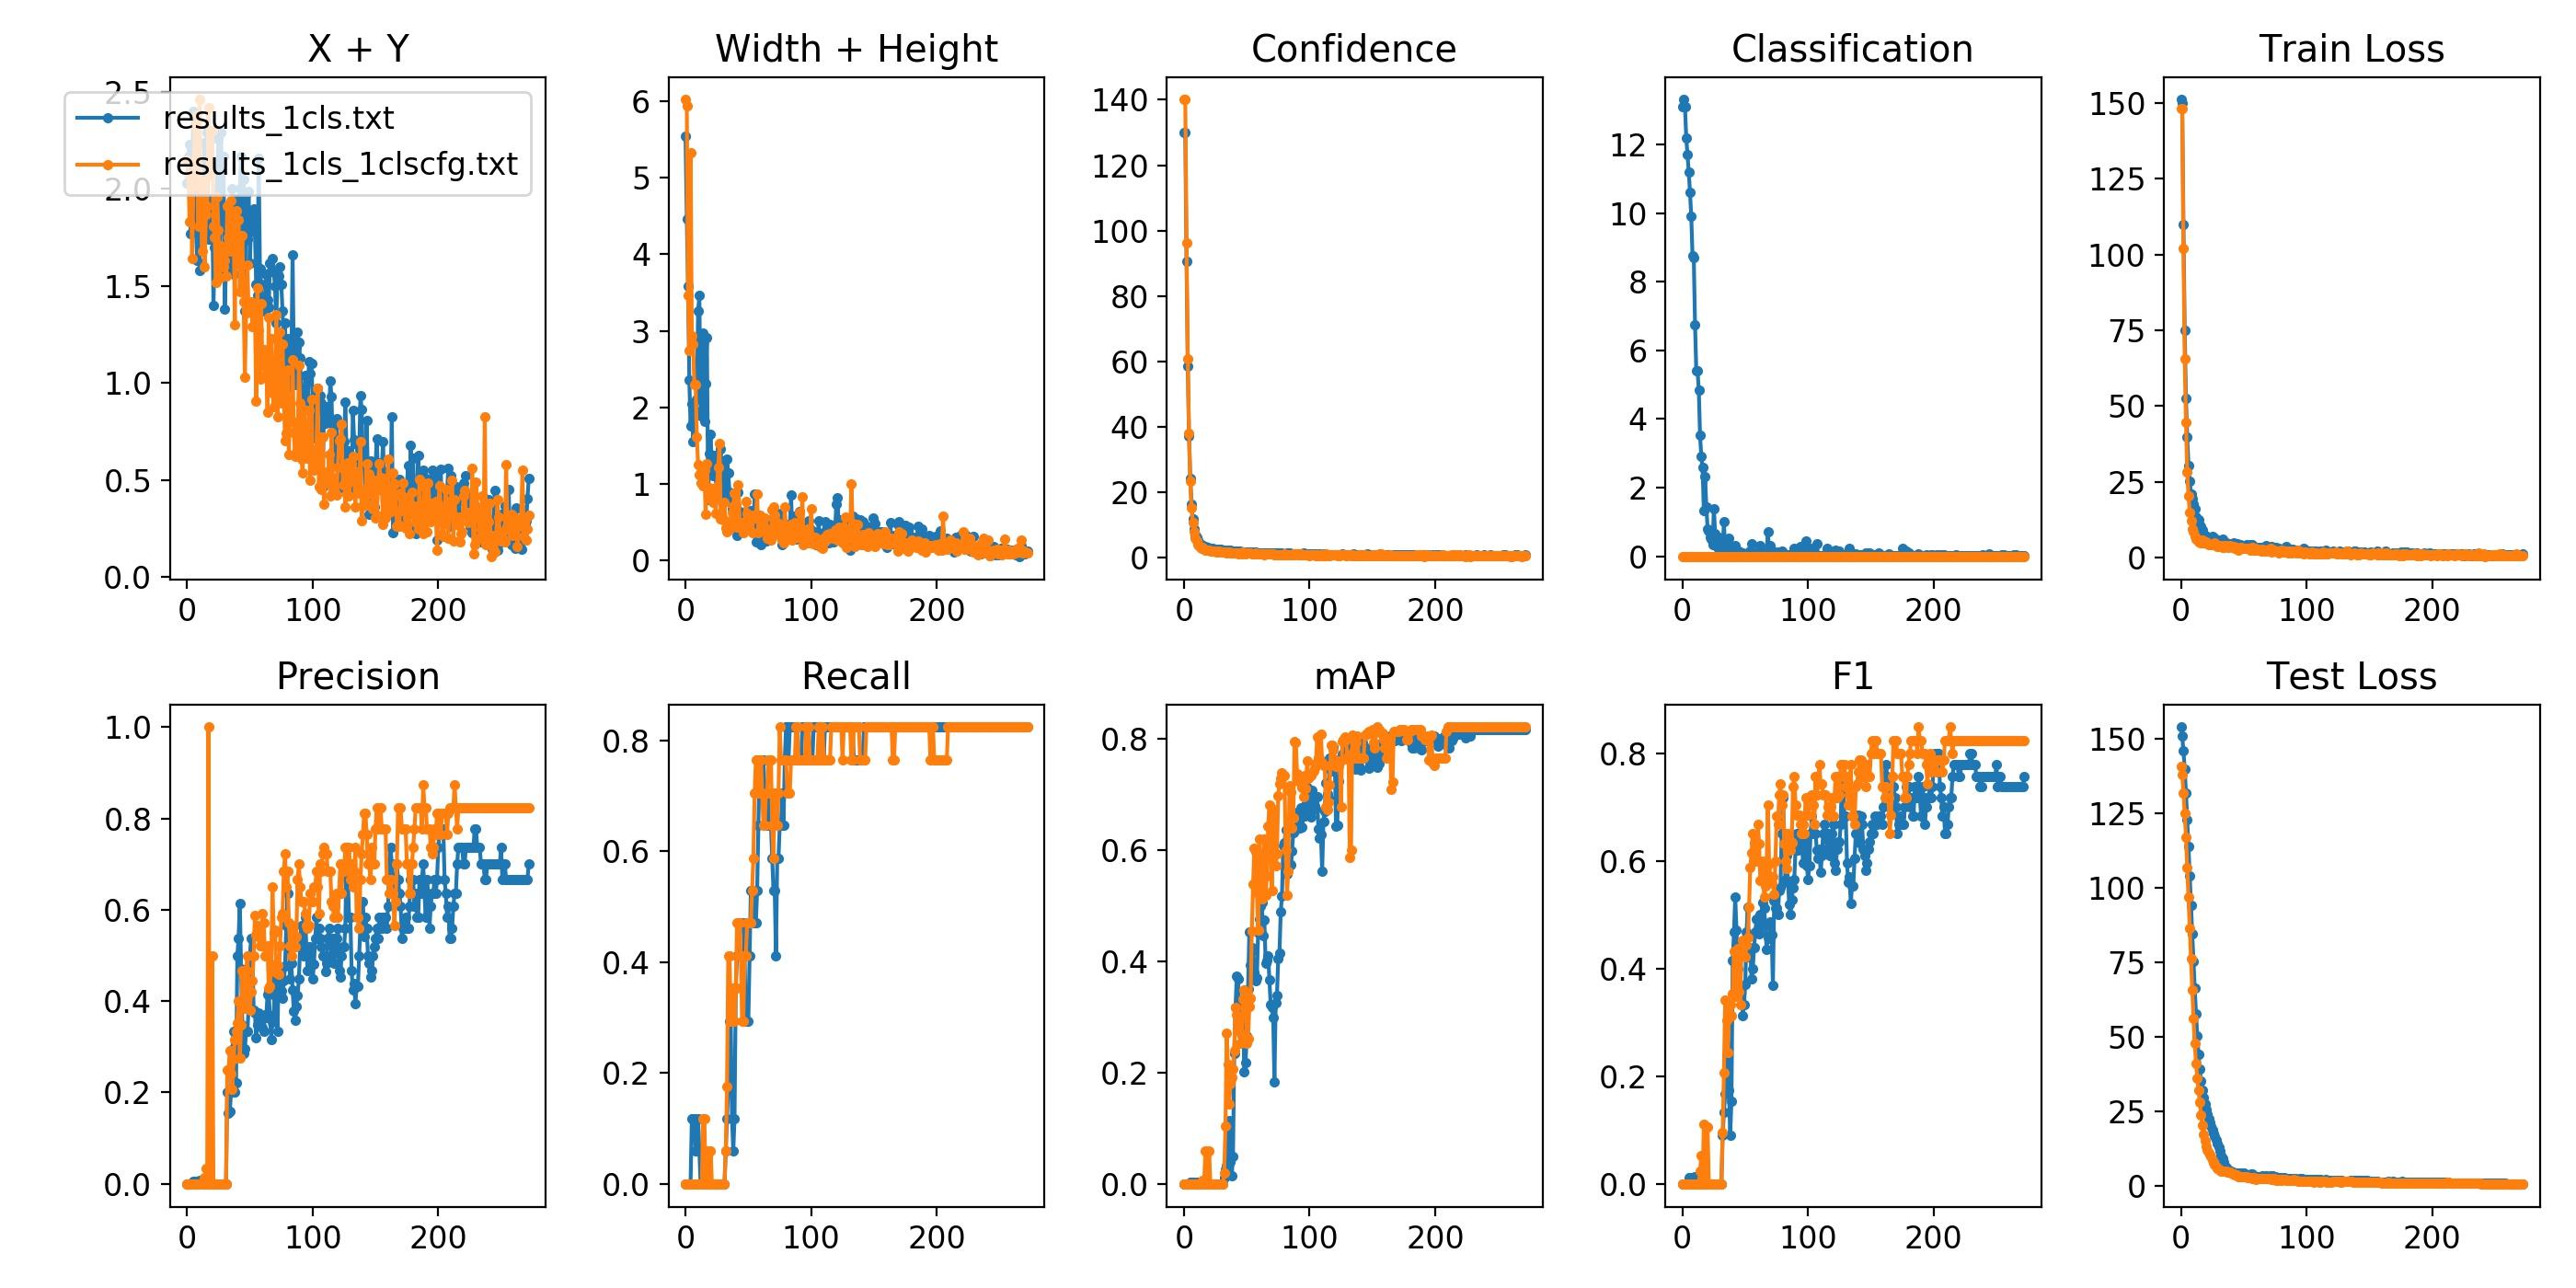 SINGLE-CLASS TRAINING EXAMPLE · Issue #102 · ultralytics/yolov3 · GitHub